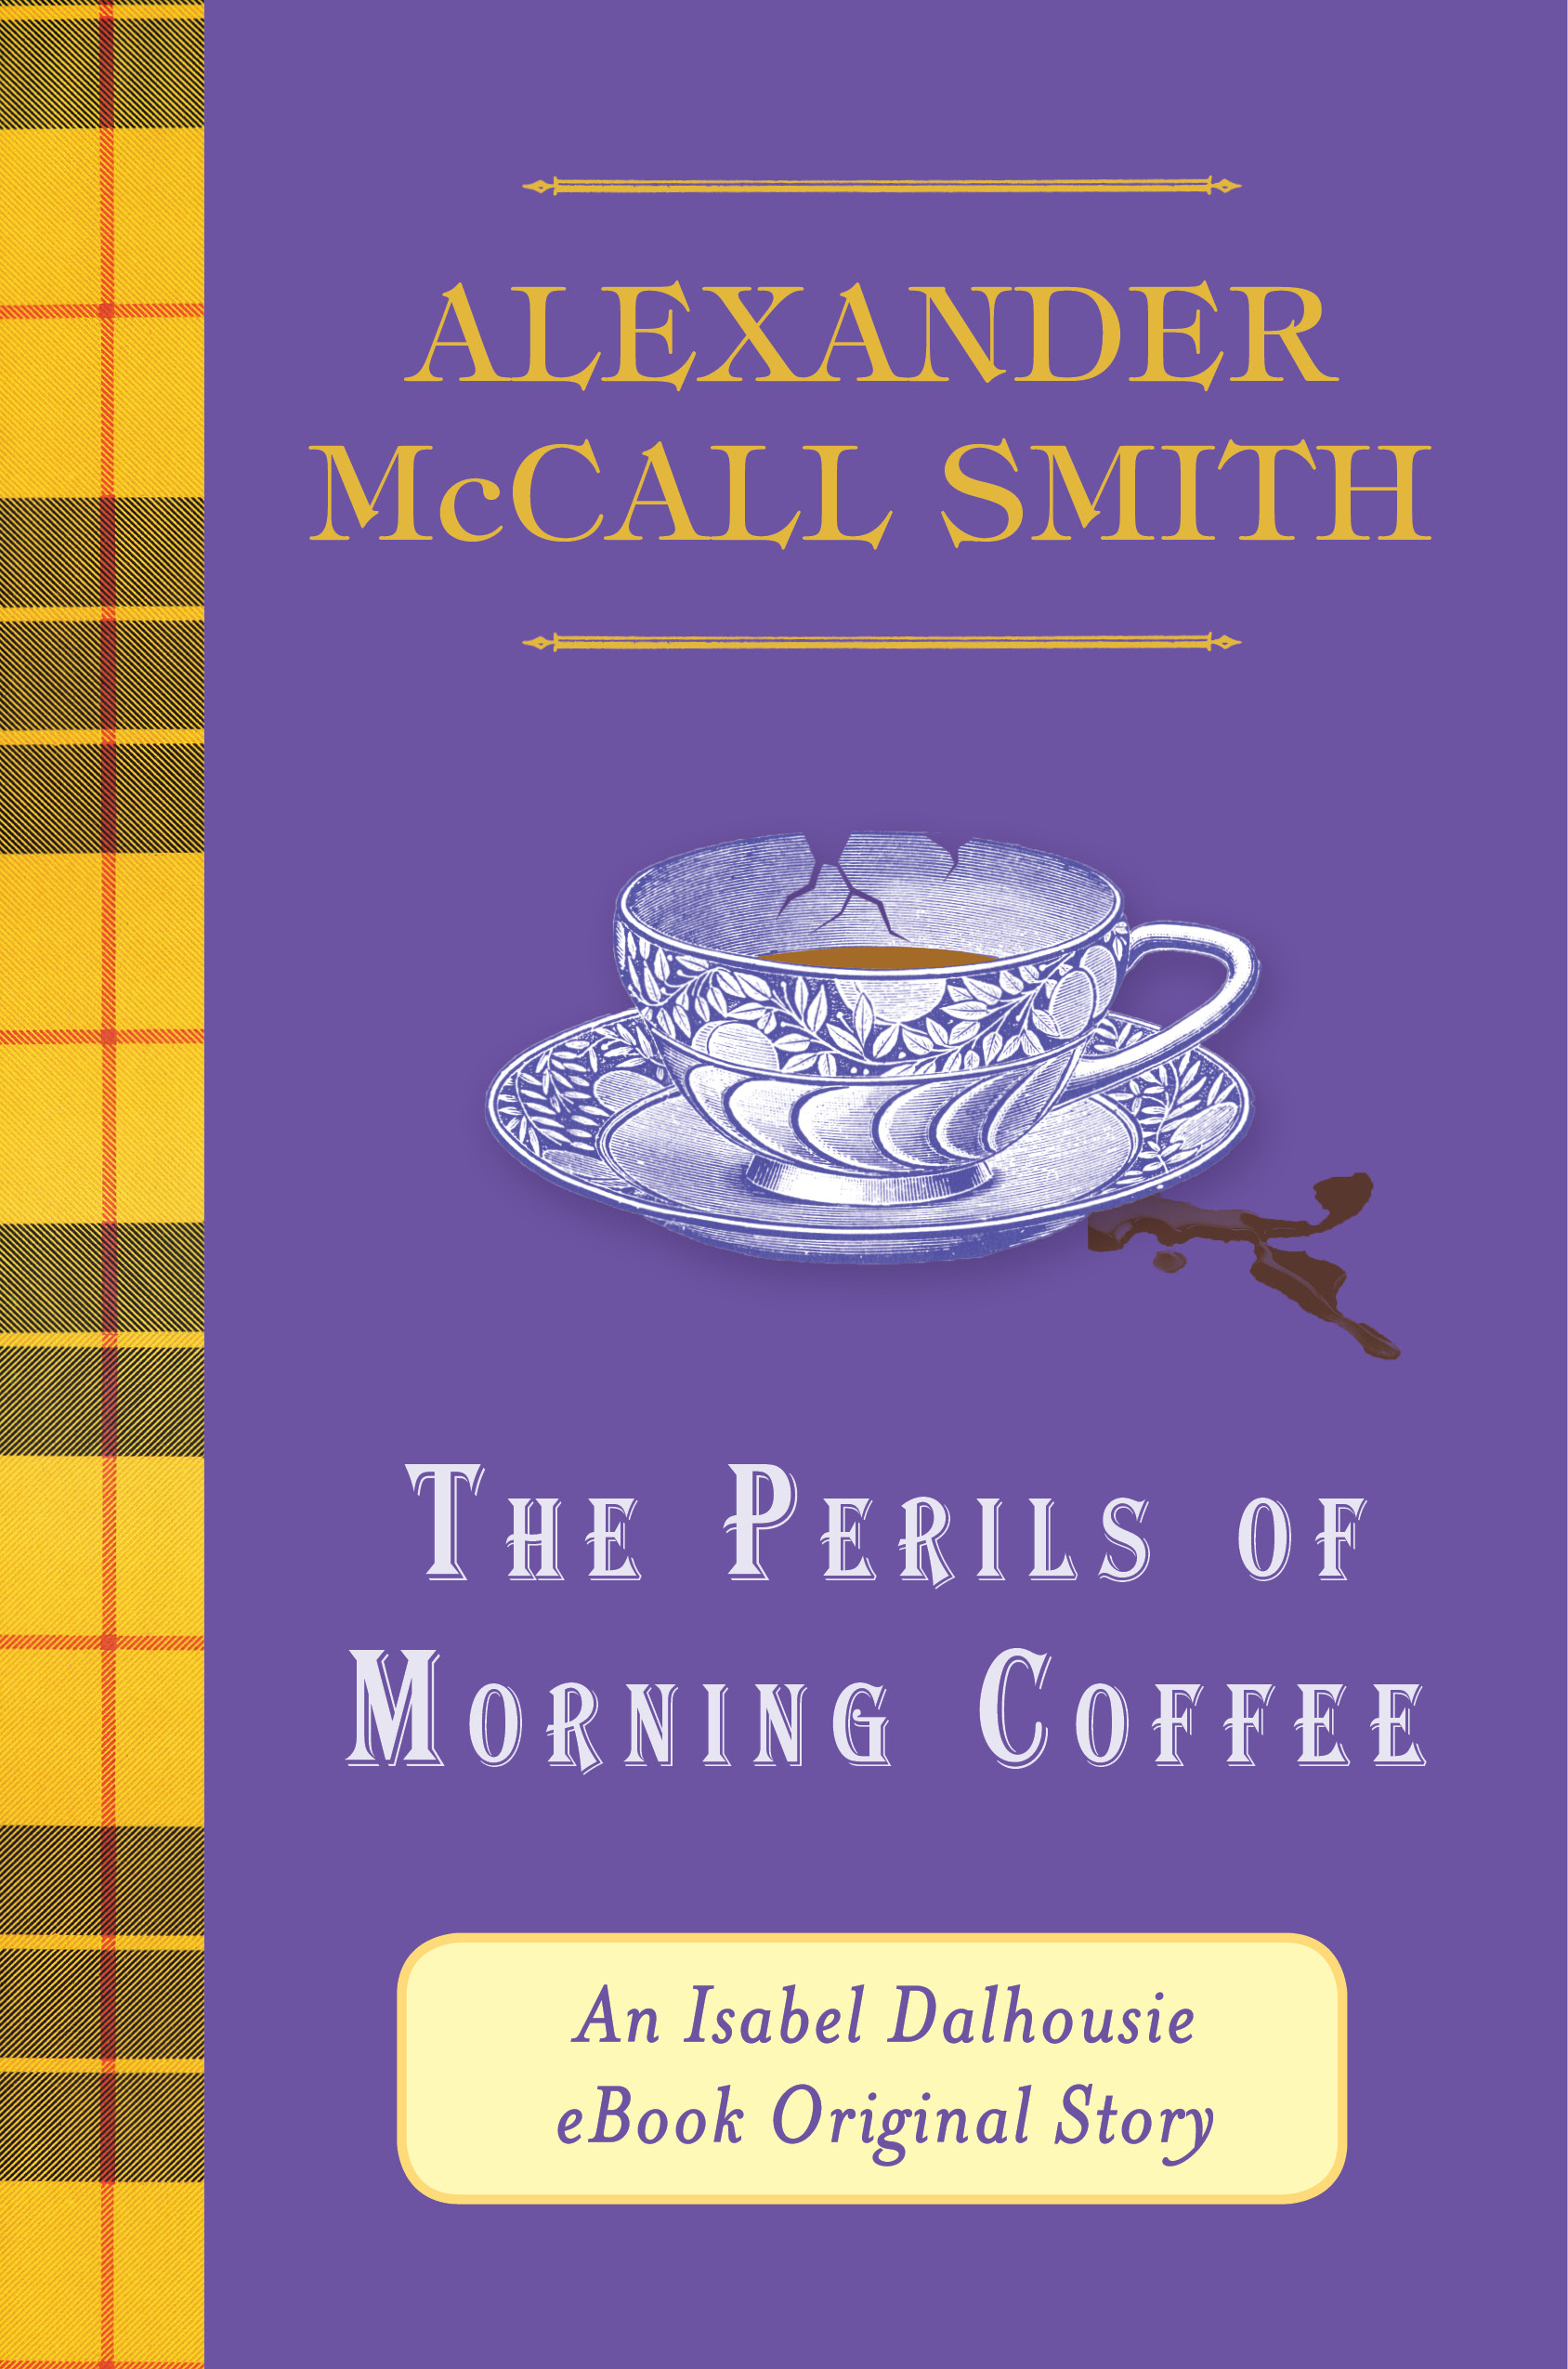 The Perils Of Morning Coffee (ebook Original)